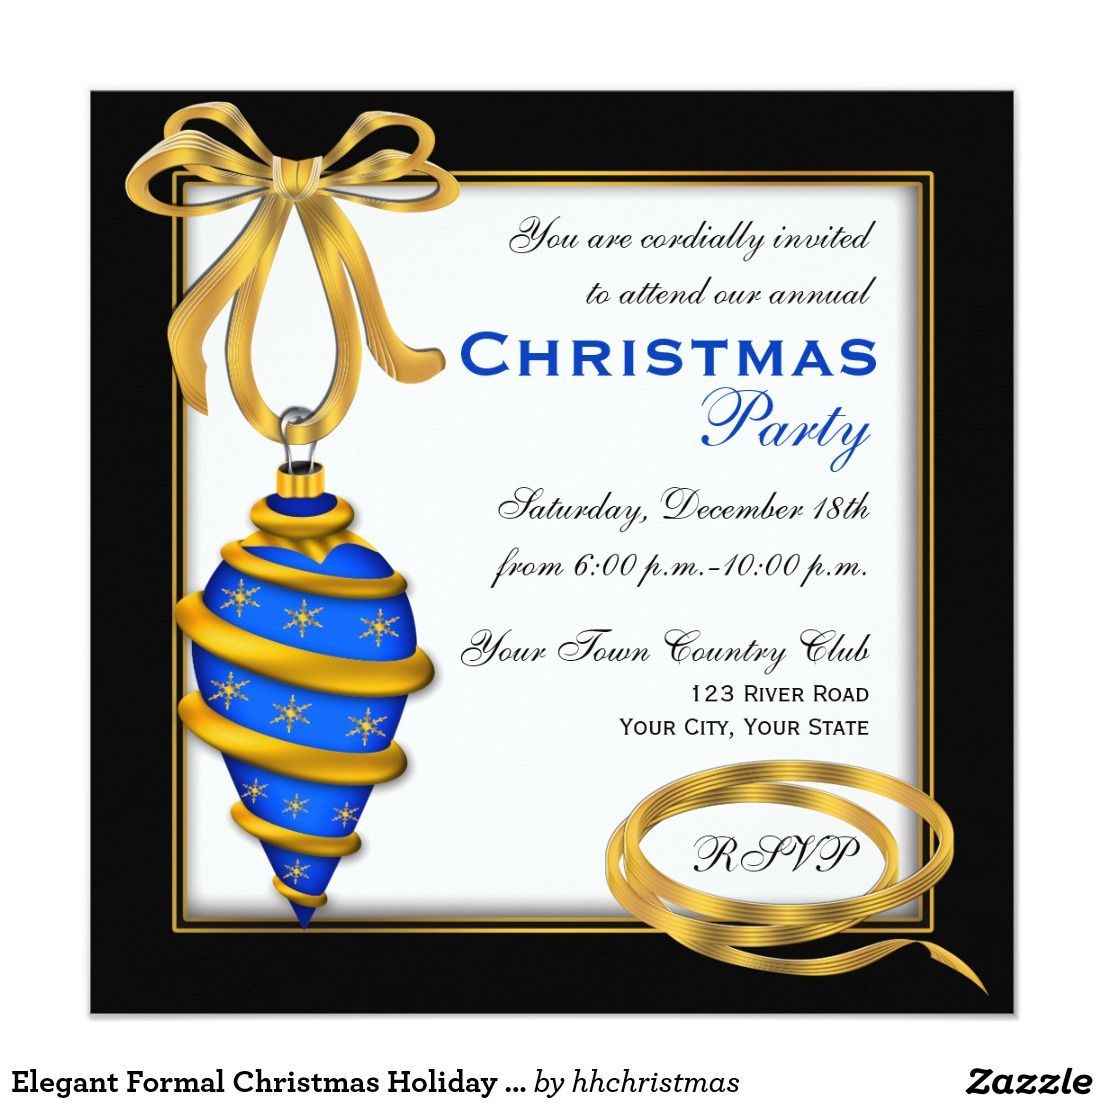 Elegant Formal Christmas Holiday Party Invitation   christmas invite ...